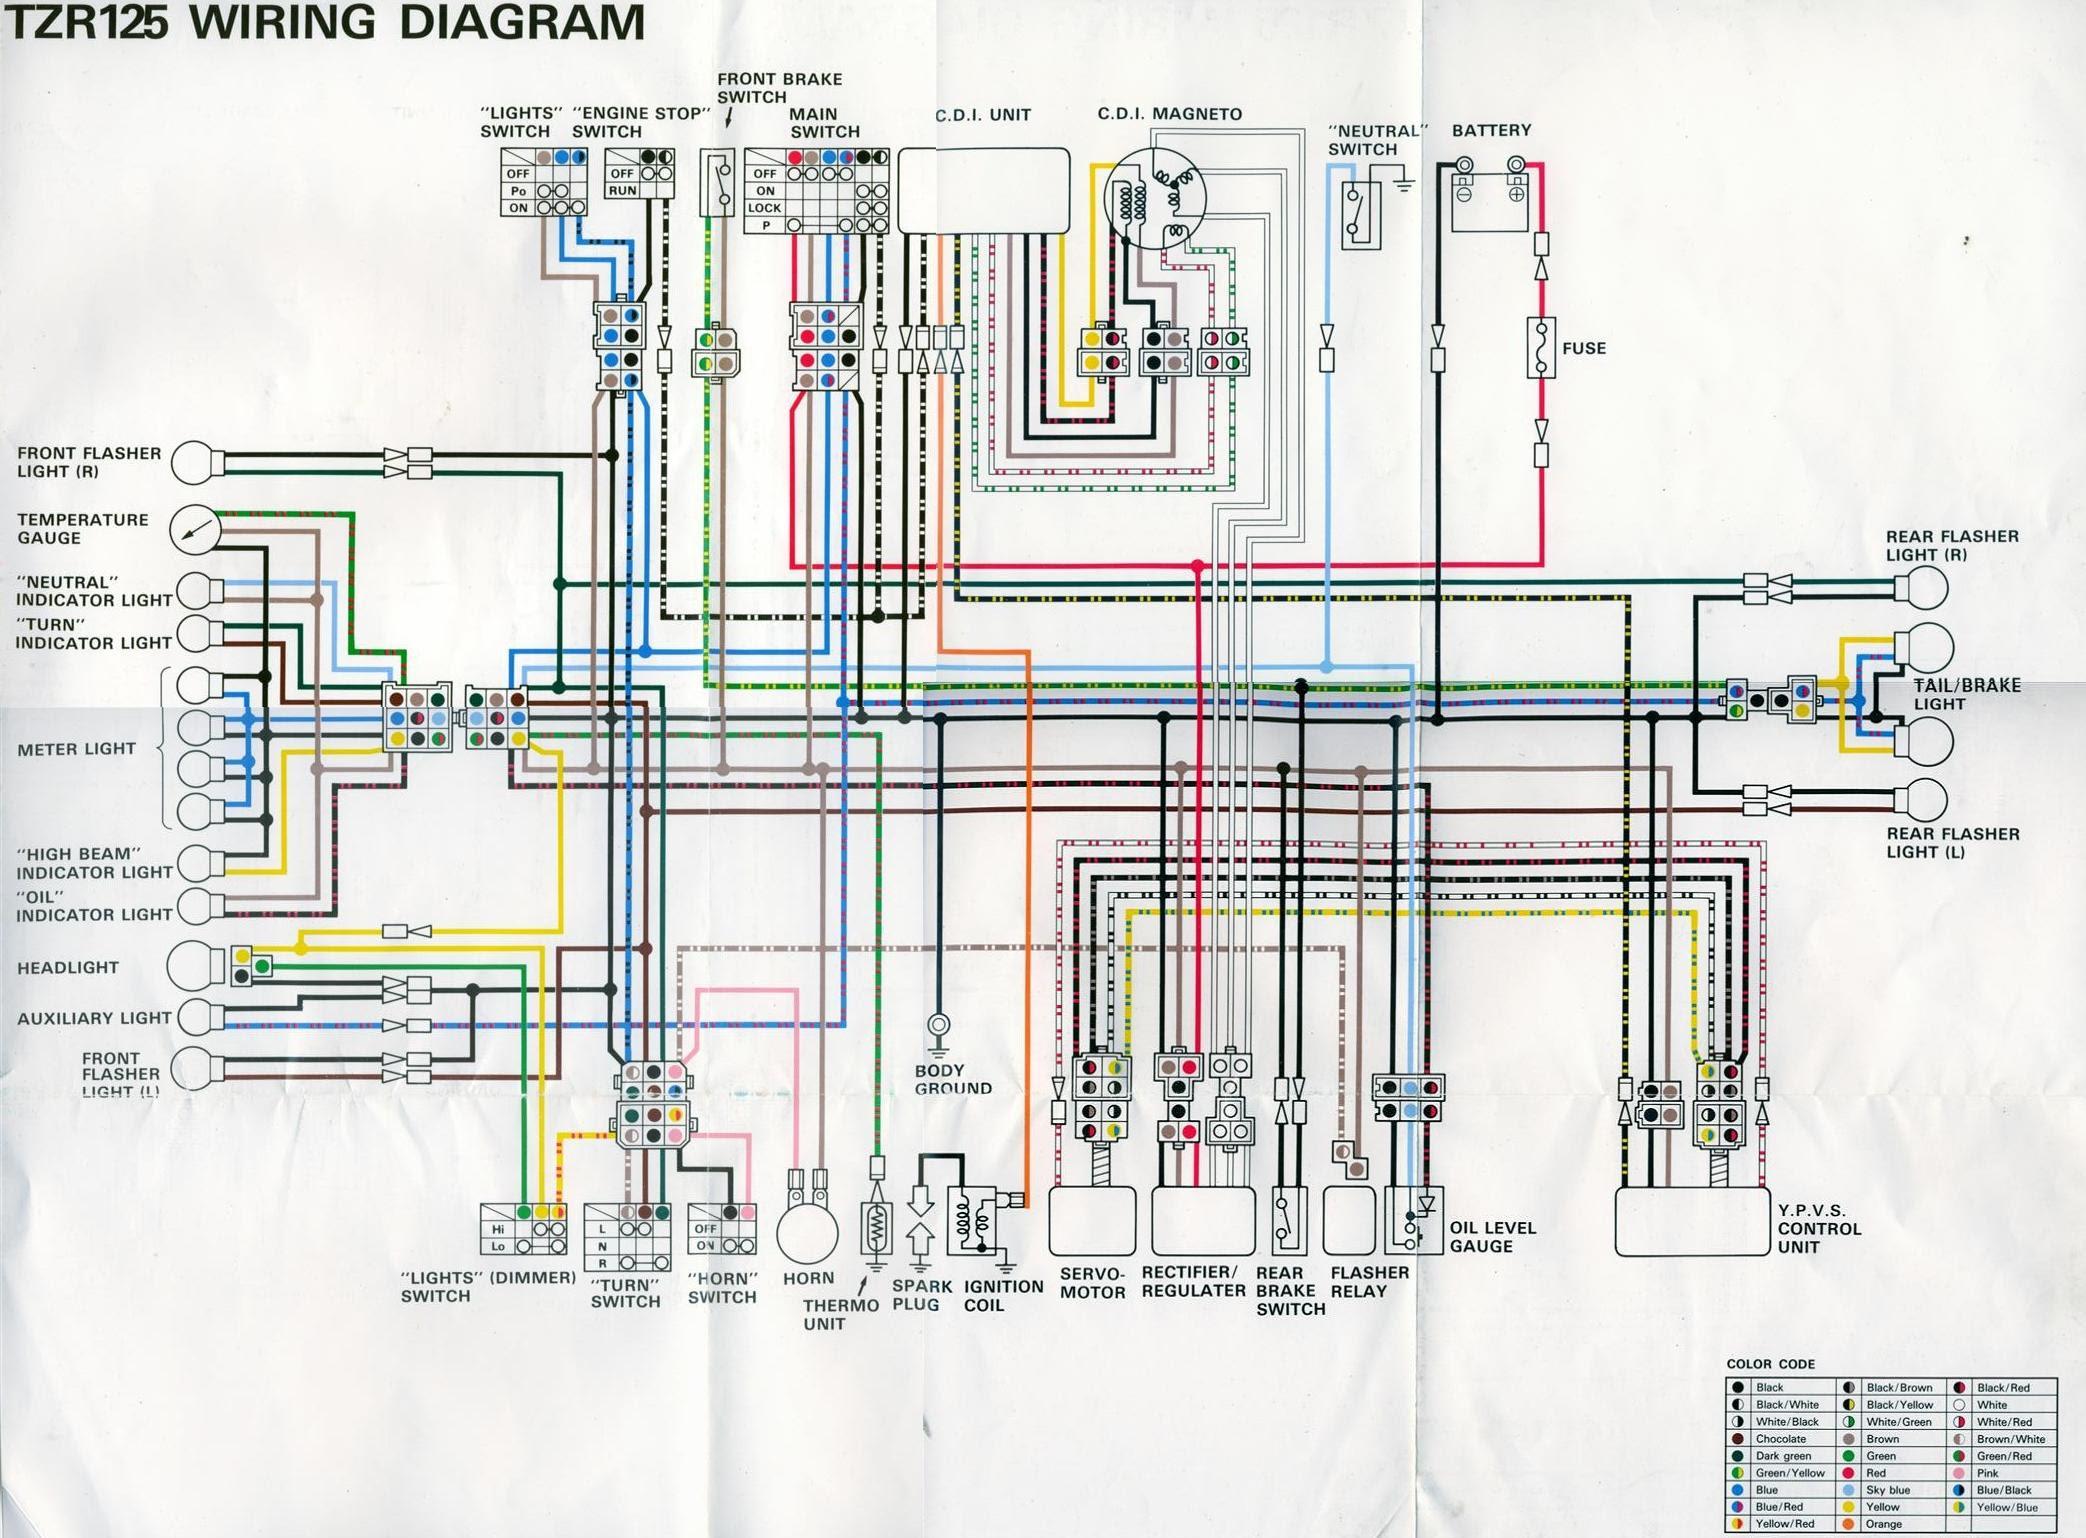 Wiring Diagram For Yamaha 350 Warrior